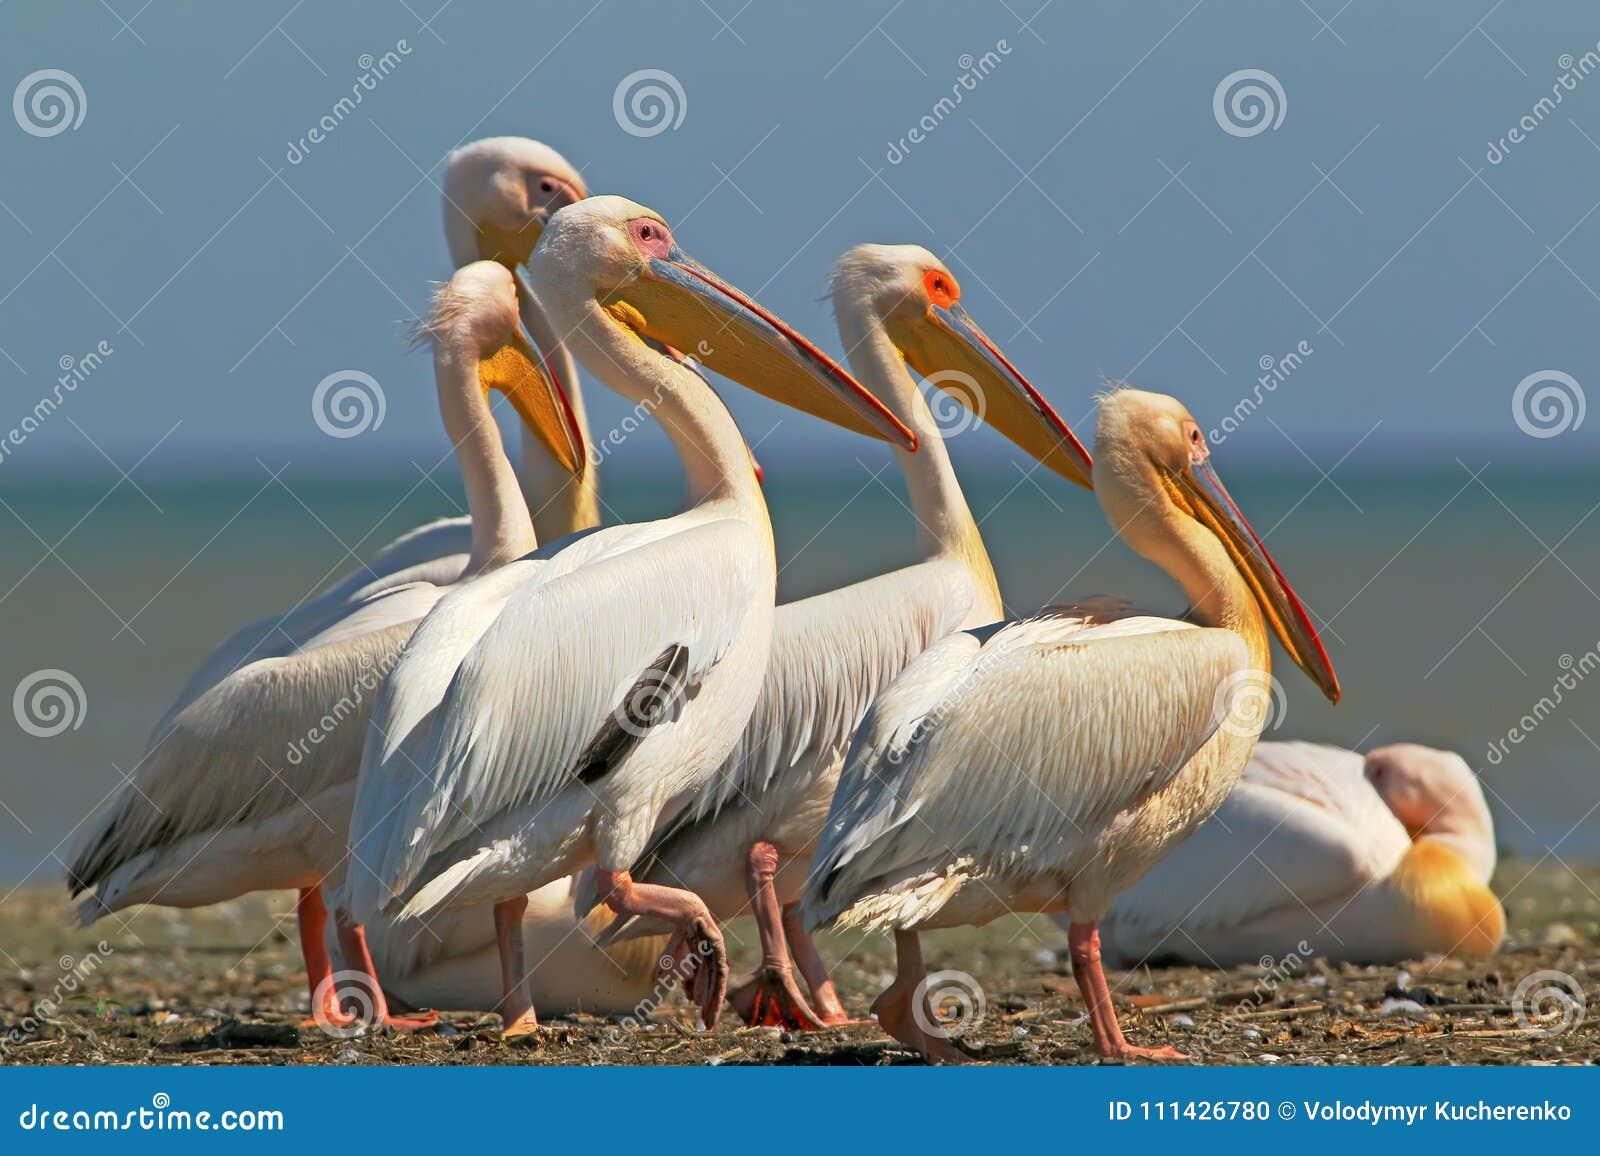 White pelicans rest on a sandbank